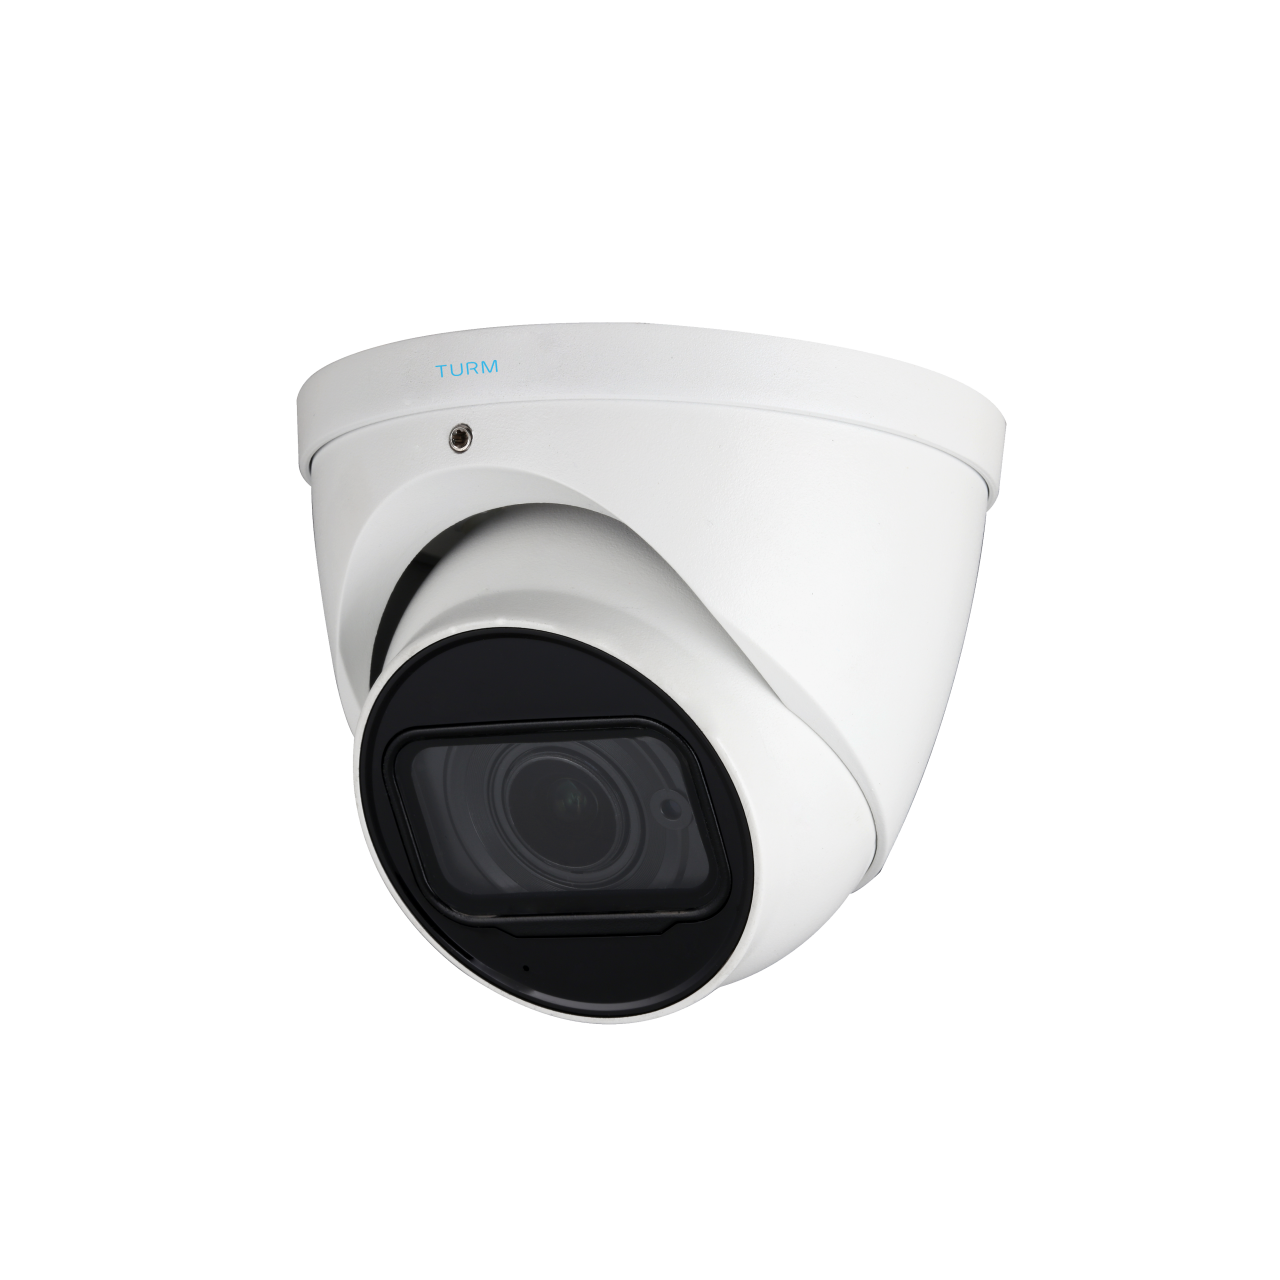 TURM HDCVI Lite 4 MP Eyeball Kamera mit 60m Nachtsicht und 2.7-12mm Motorzoom